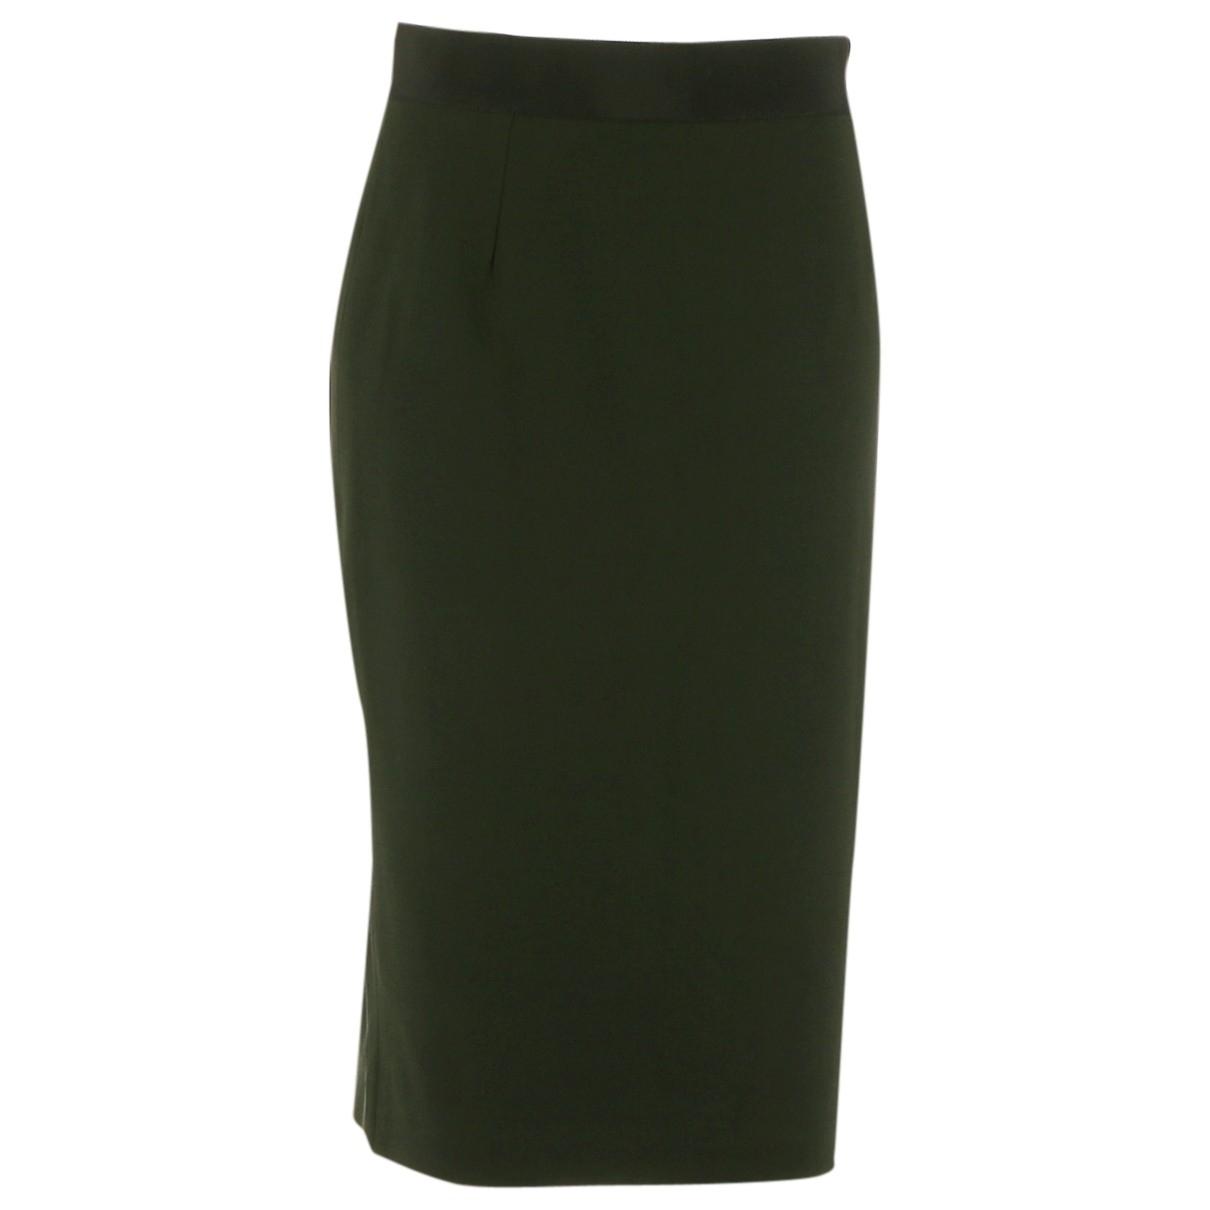 Dolce & Gabbana \N Green Wool skirt for Women 42 FR